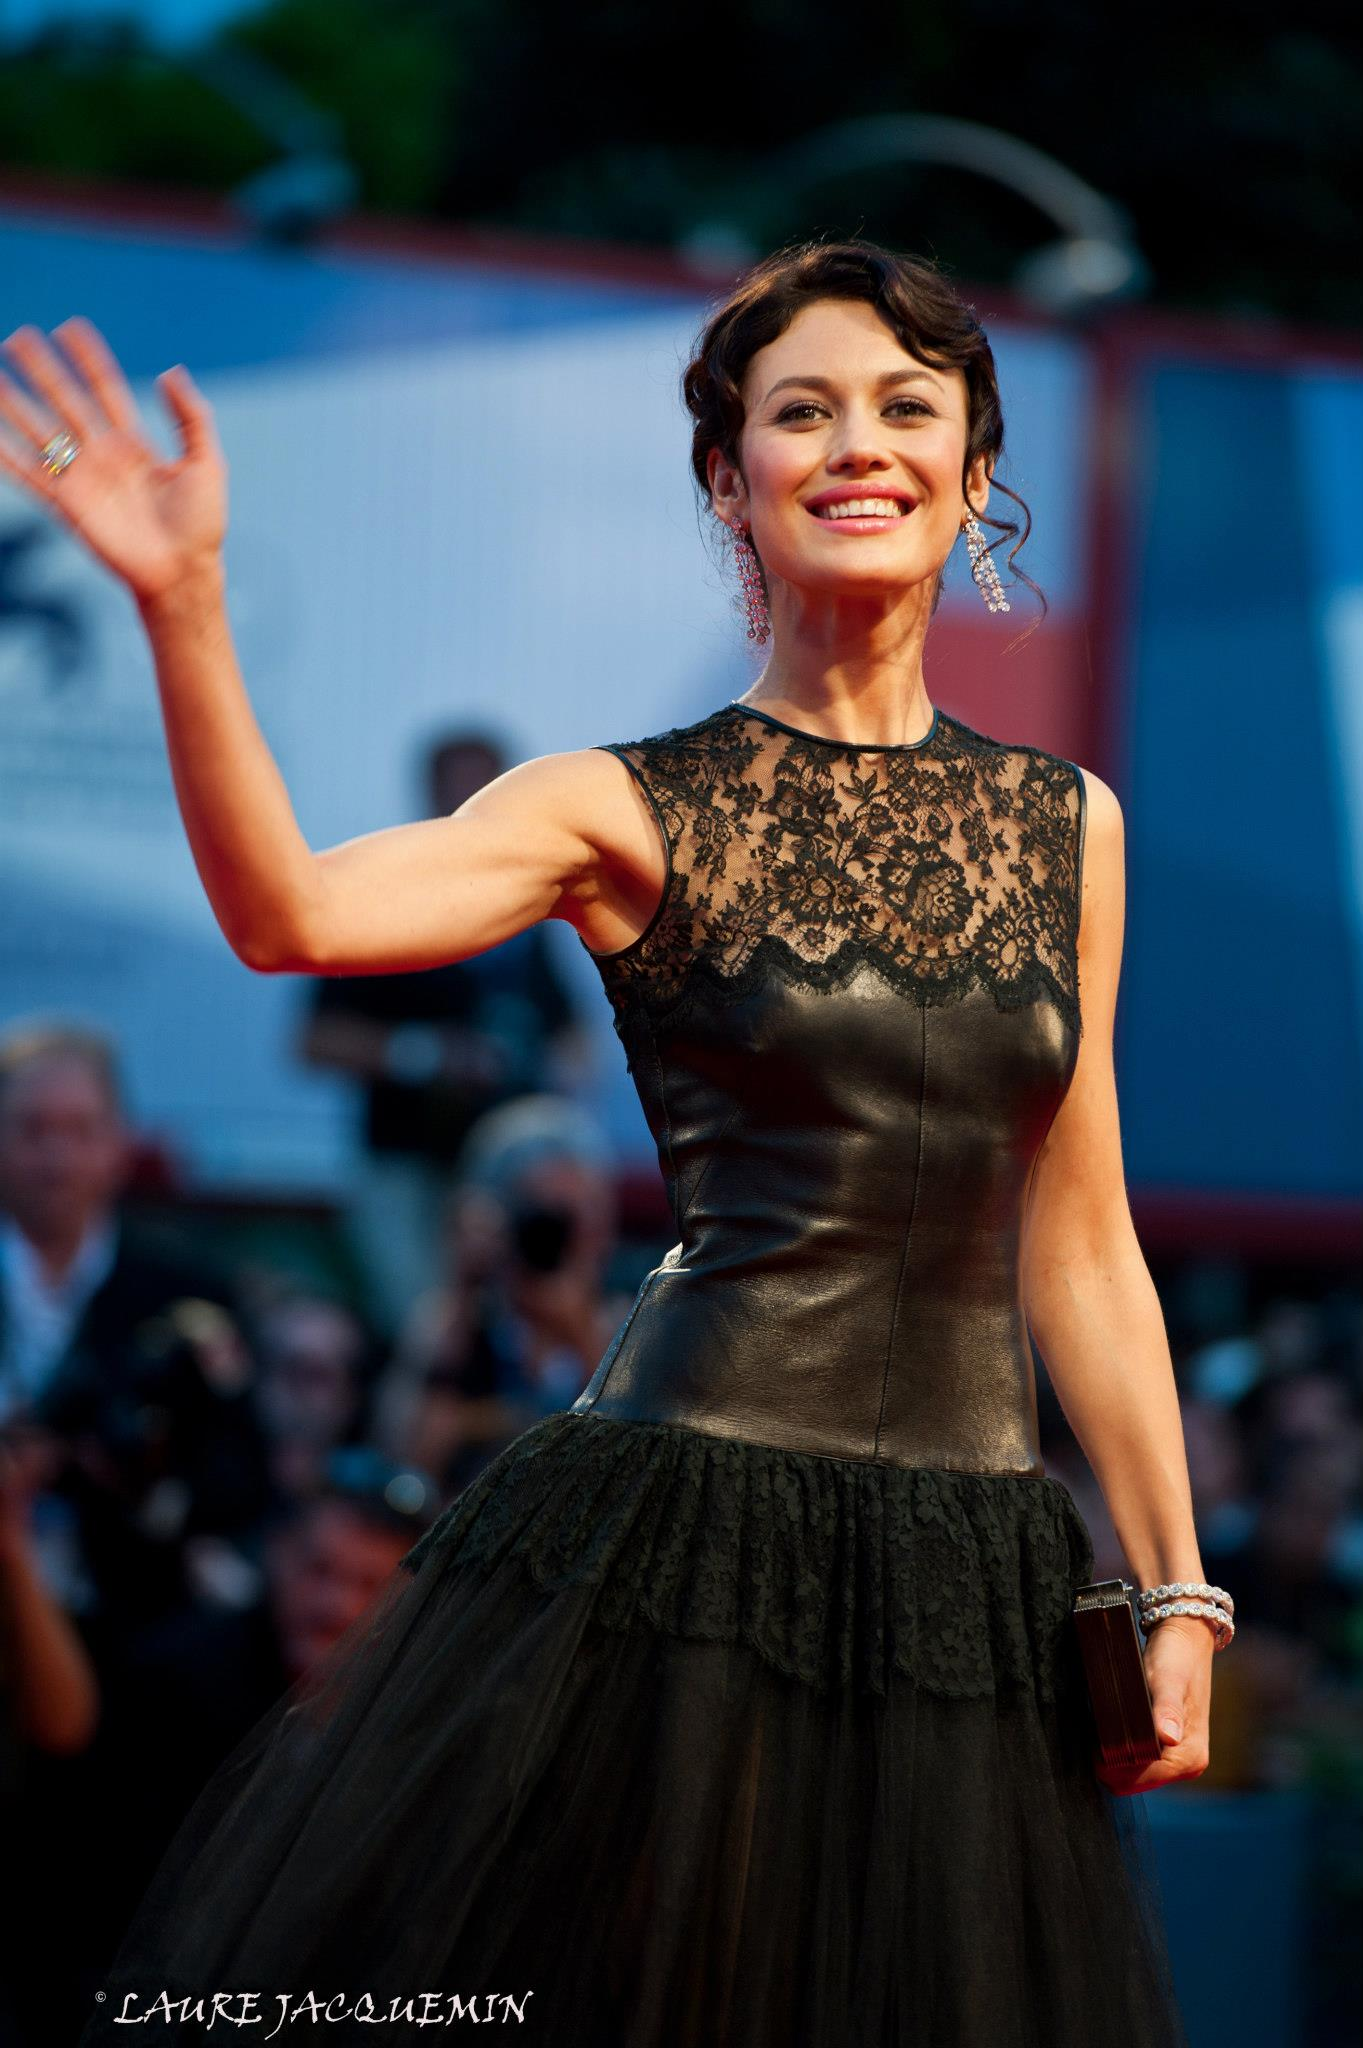 venice film festival venice laure jacquemin (40).jpg